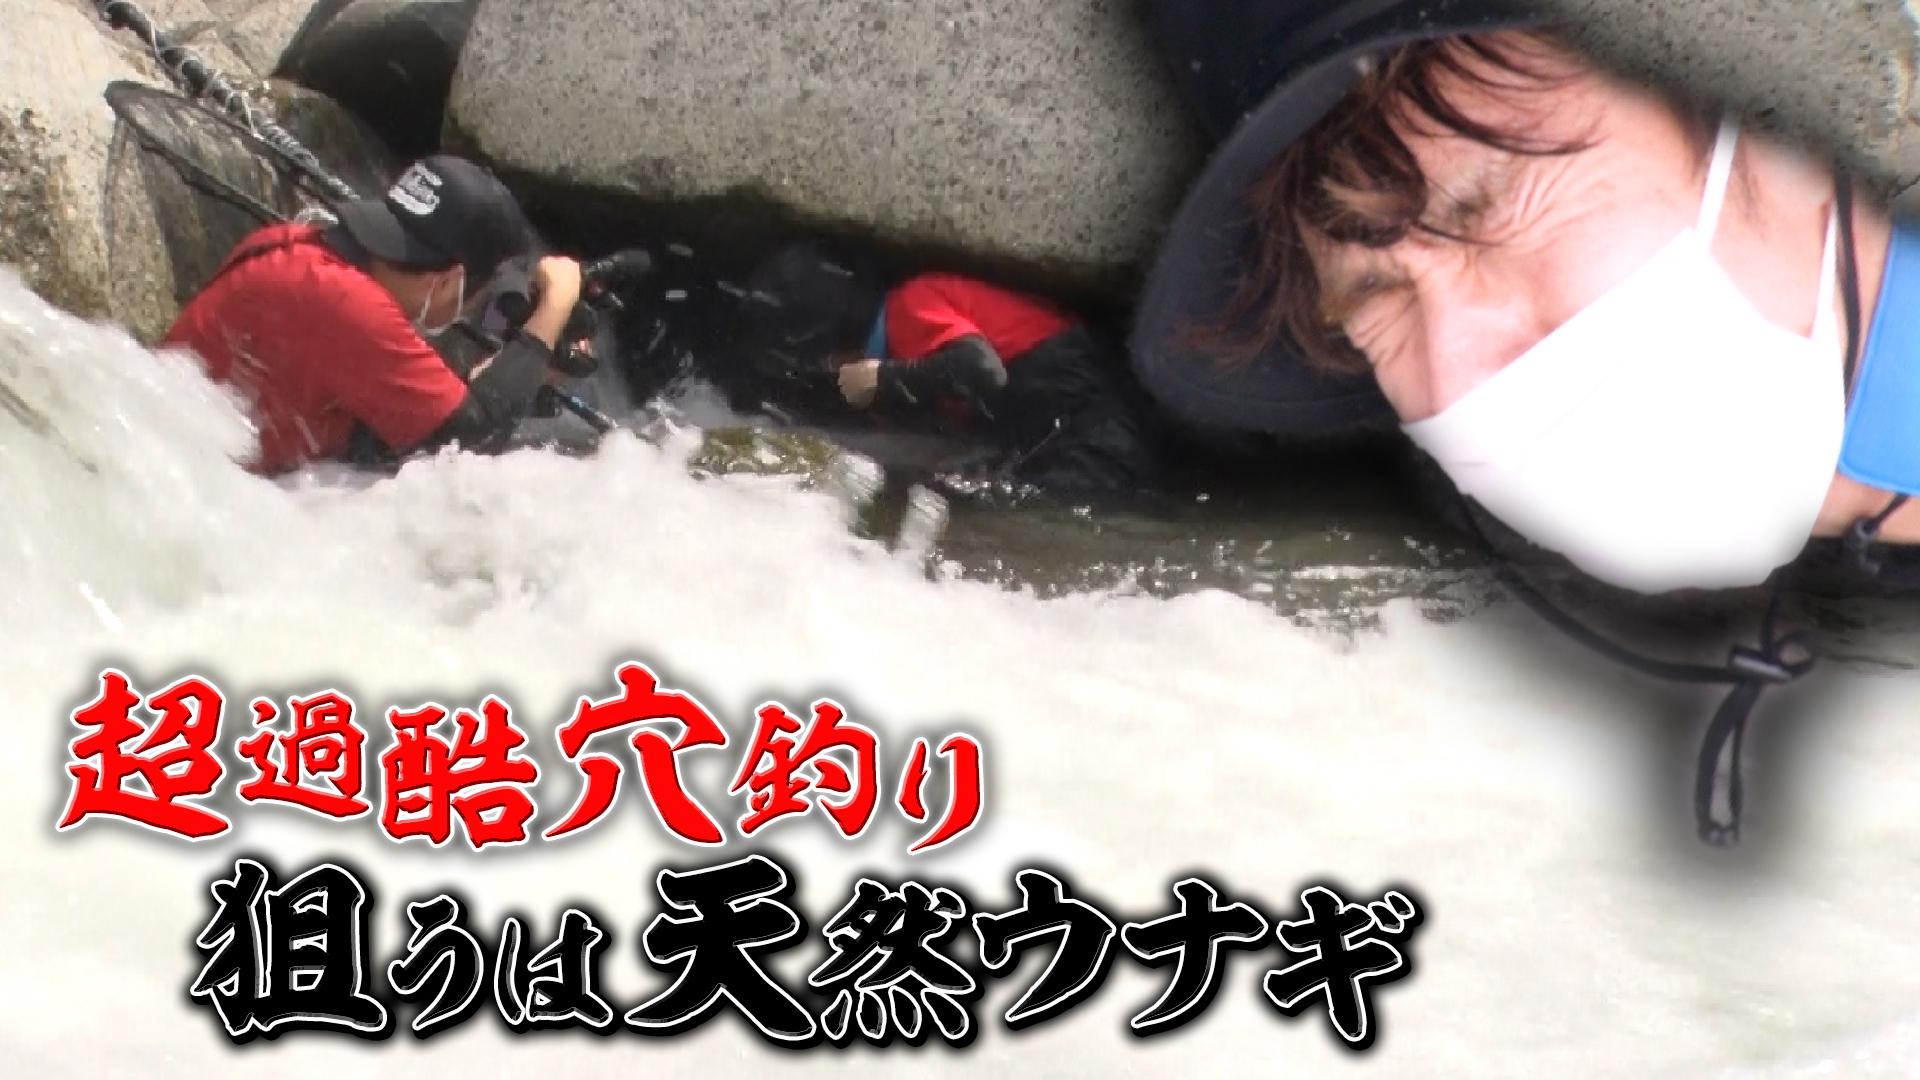 KAT-TUNの食宝ゲッットゥーン #22 中丸、激流天然ウナギ釣りに大苦戦!?